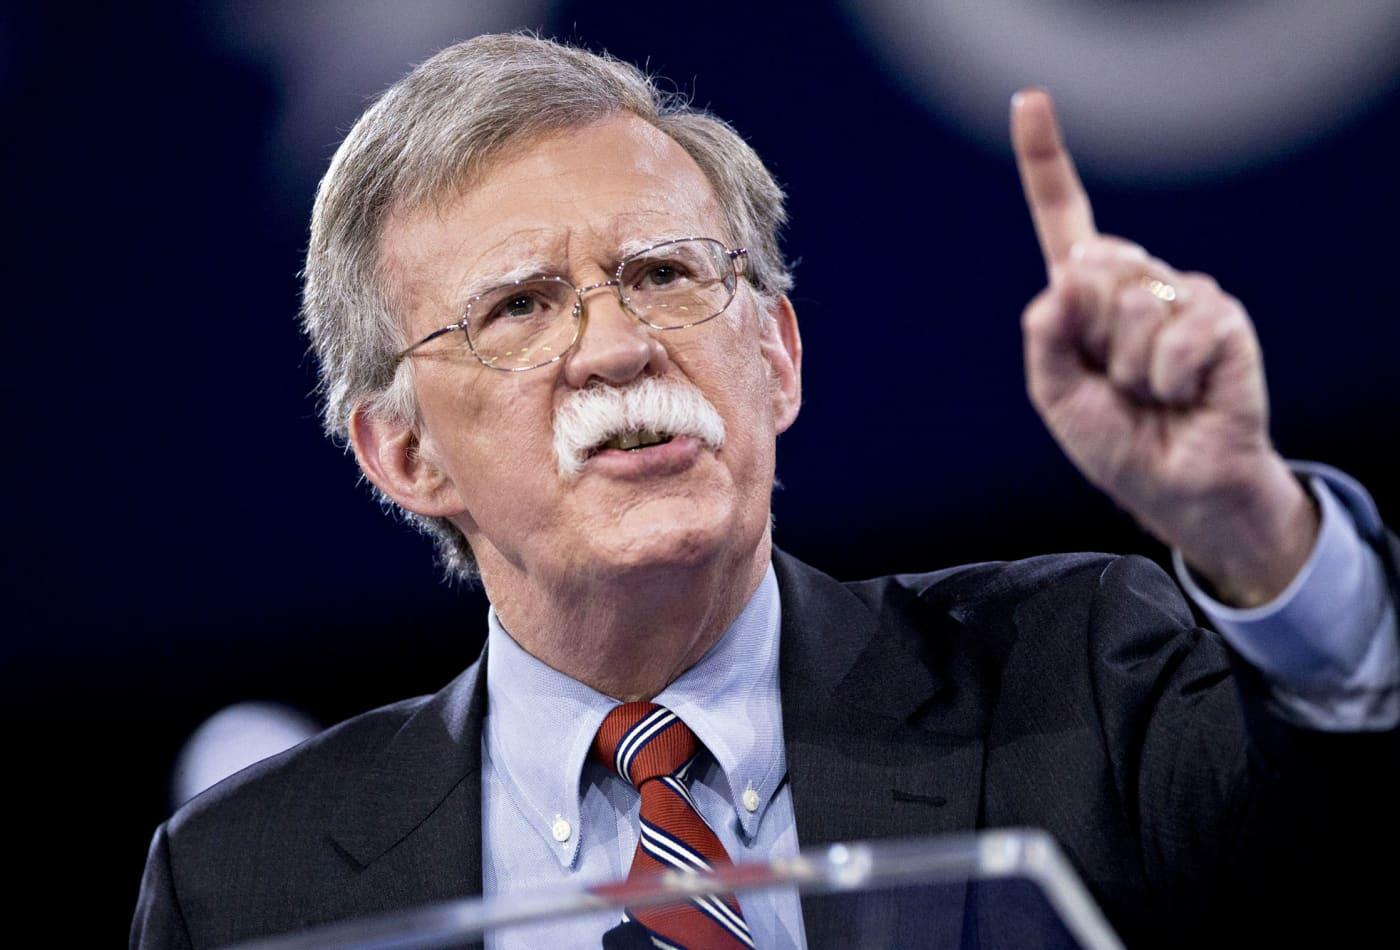 House Democrats ask John Bolton to testify in Trump impeachment probe on Nov. 7